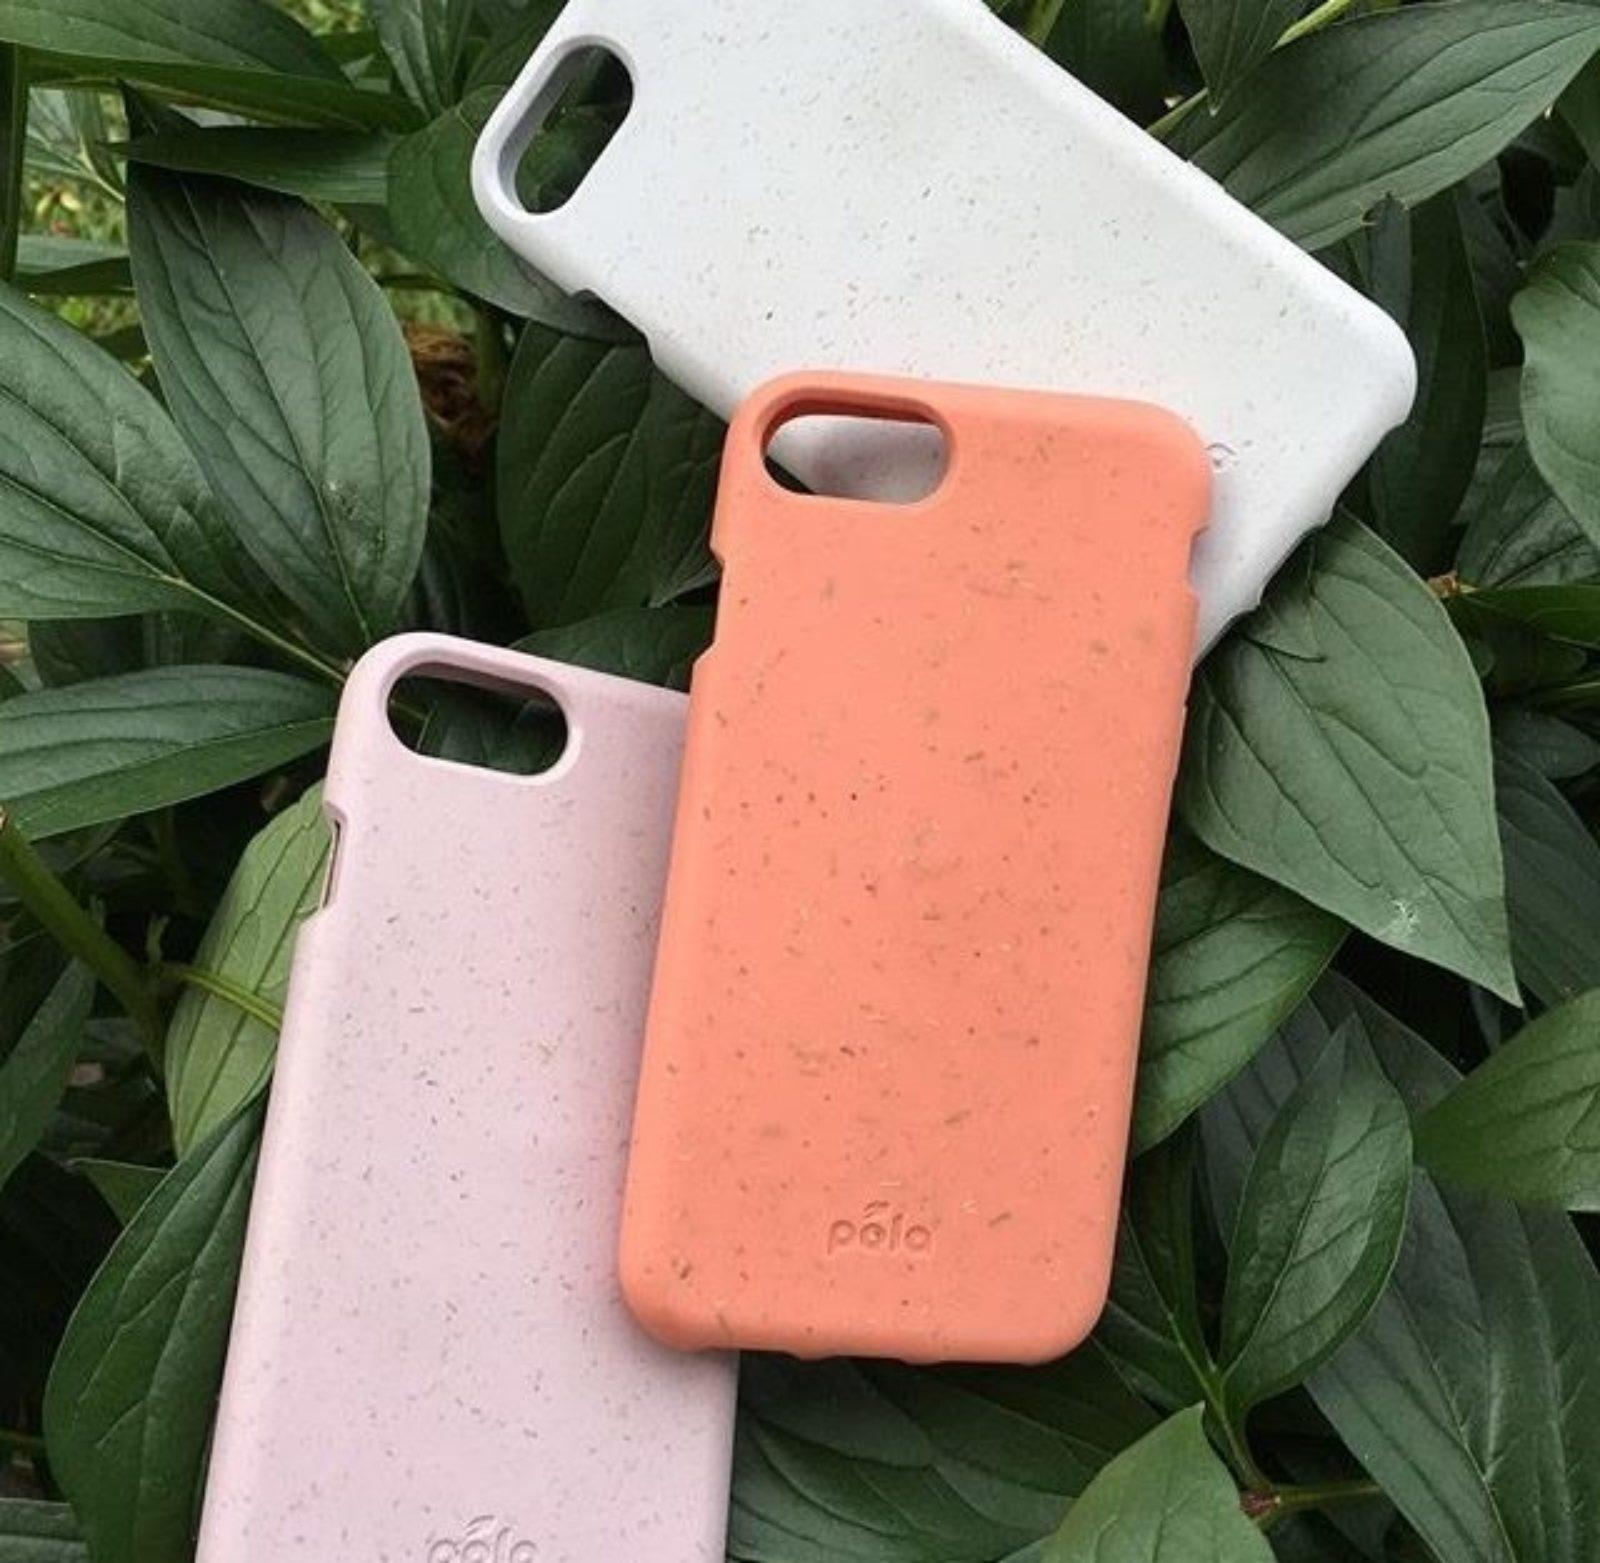 A Pela biológiailag lebomló telefontokjai